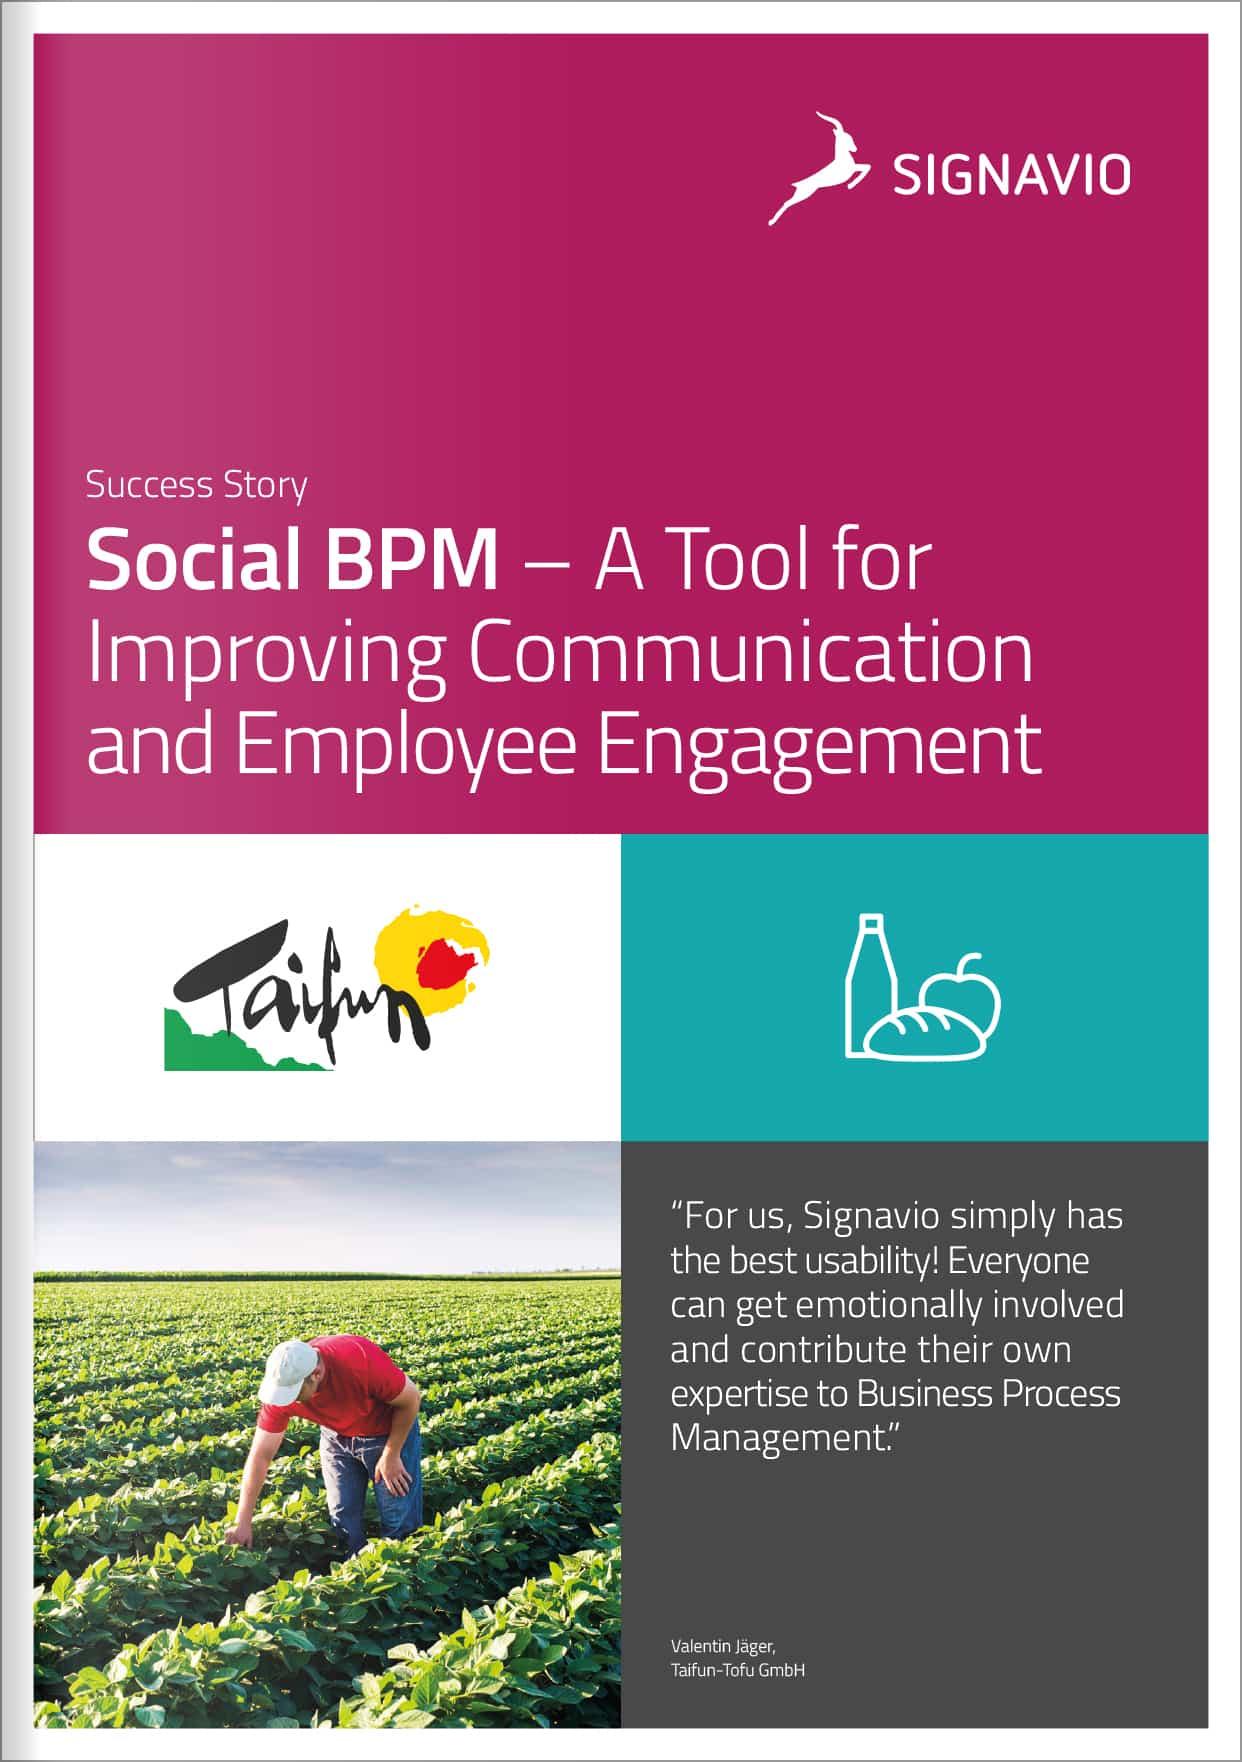 Social BPM - Taifun-Tofu GmbH